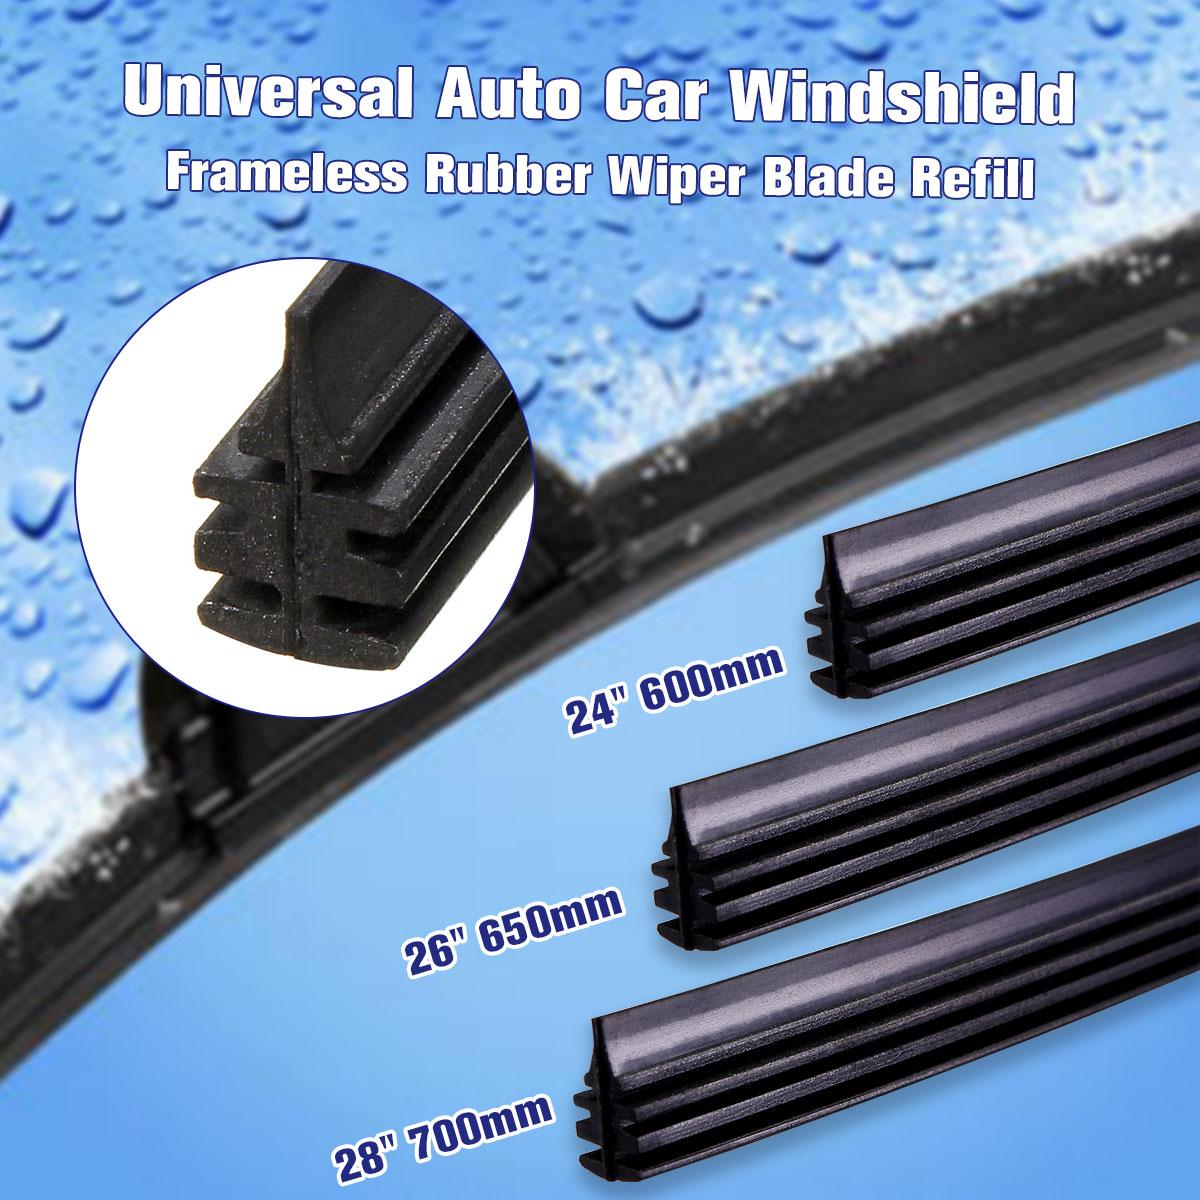 Universal 28 700mm Rubber Frameless Windscreen Wiper Blade Strips Wiper Blades For Car Bus Van Truck Soft Rubber